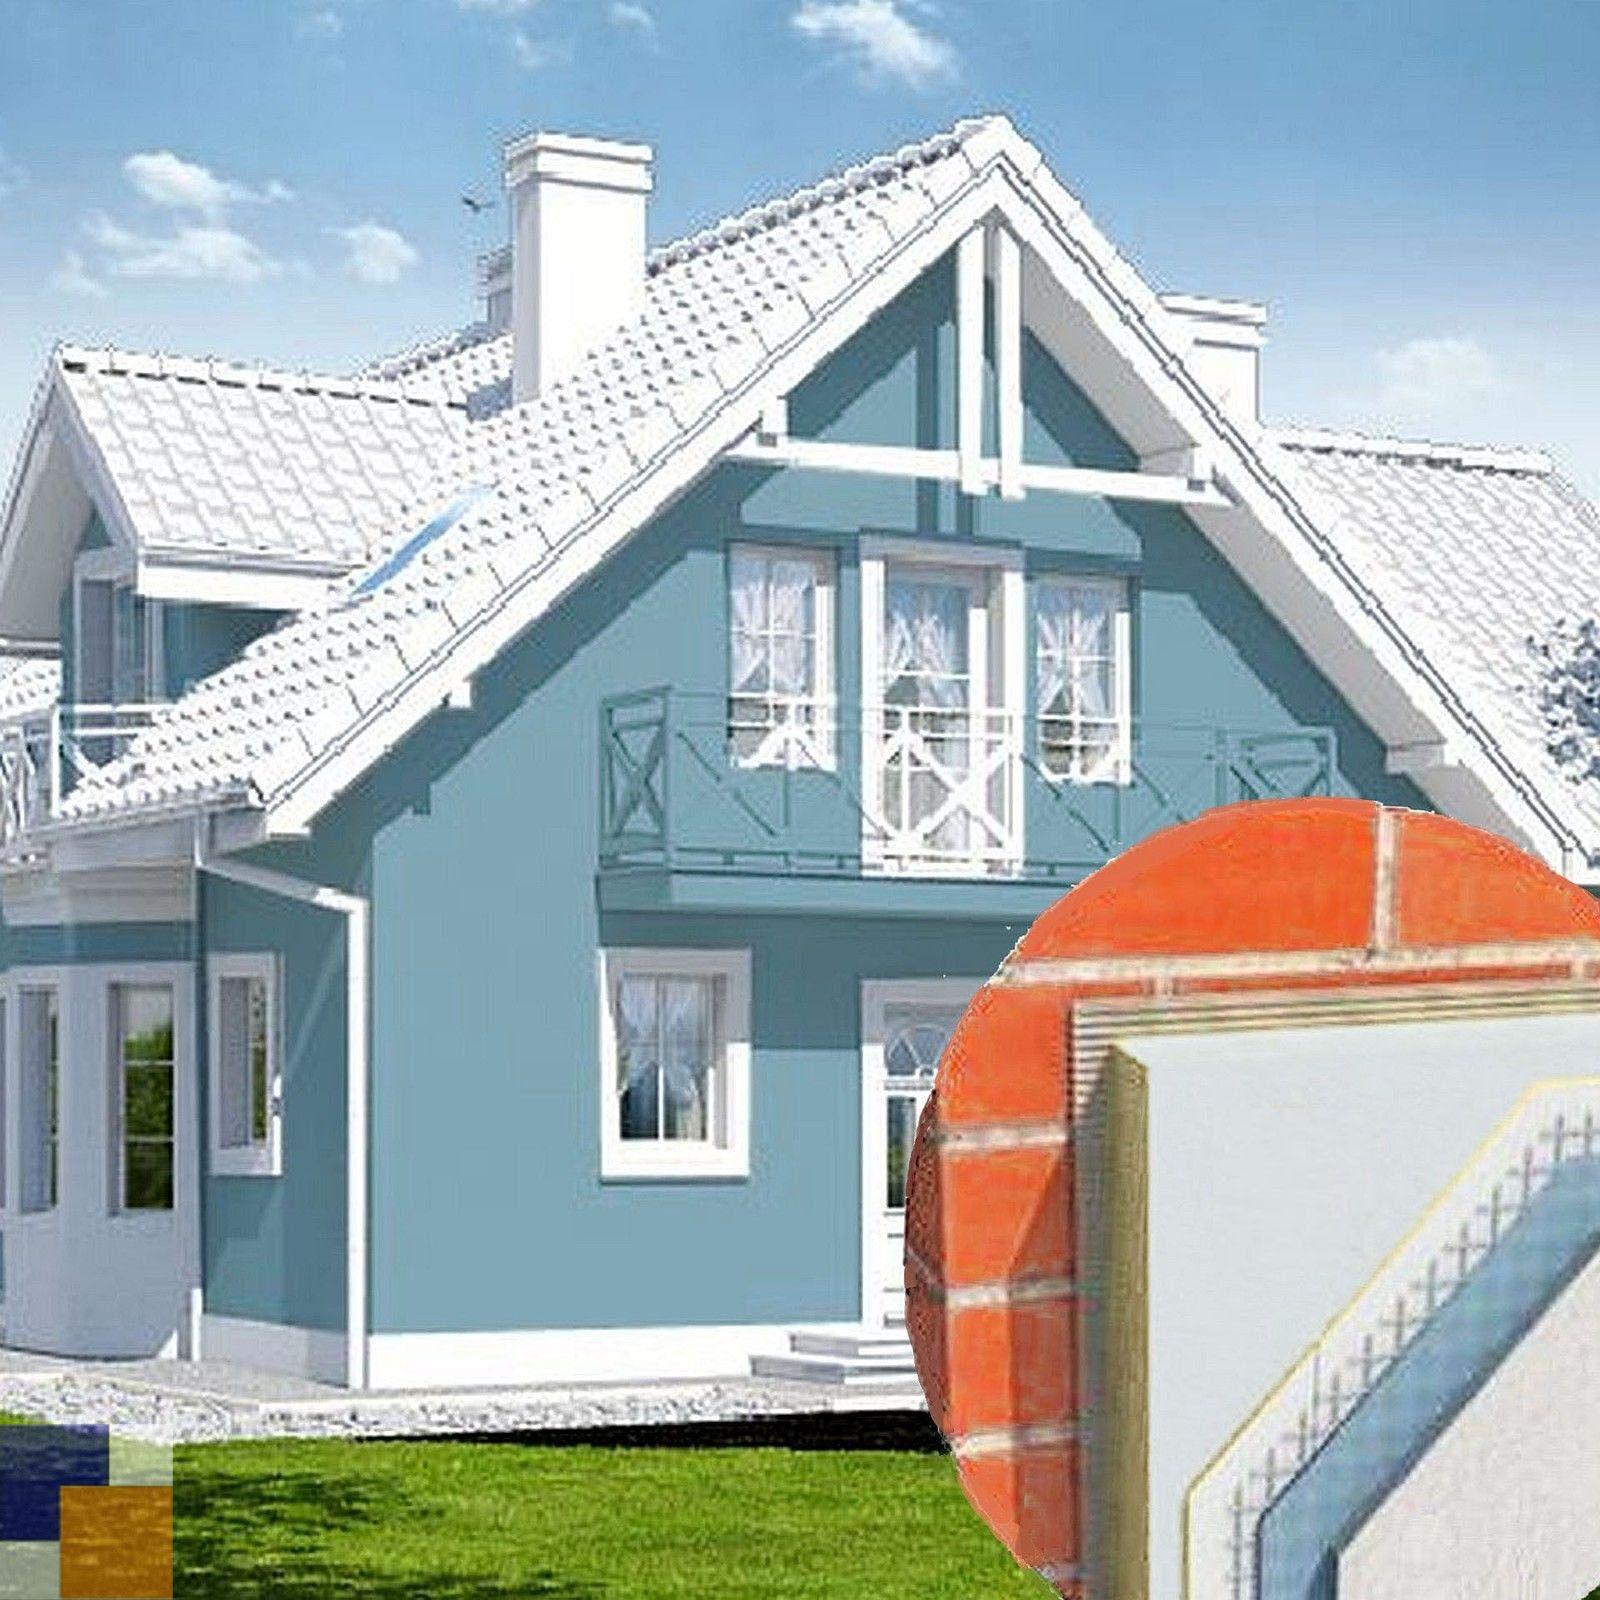 200 qm 100 mm  WDVS KOMPLETTPAKET Fassadendämmung Dämmung